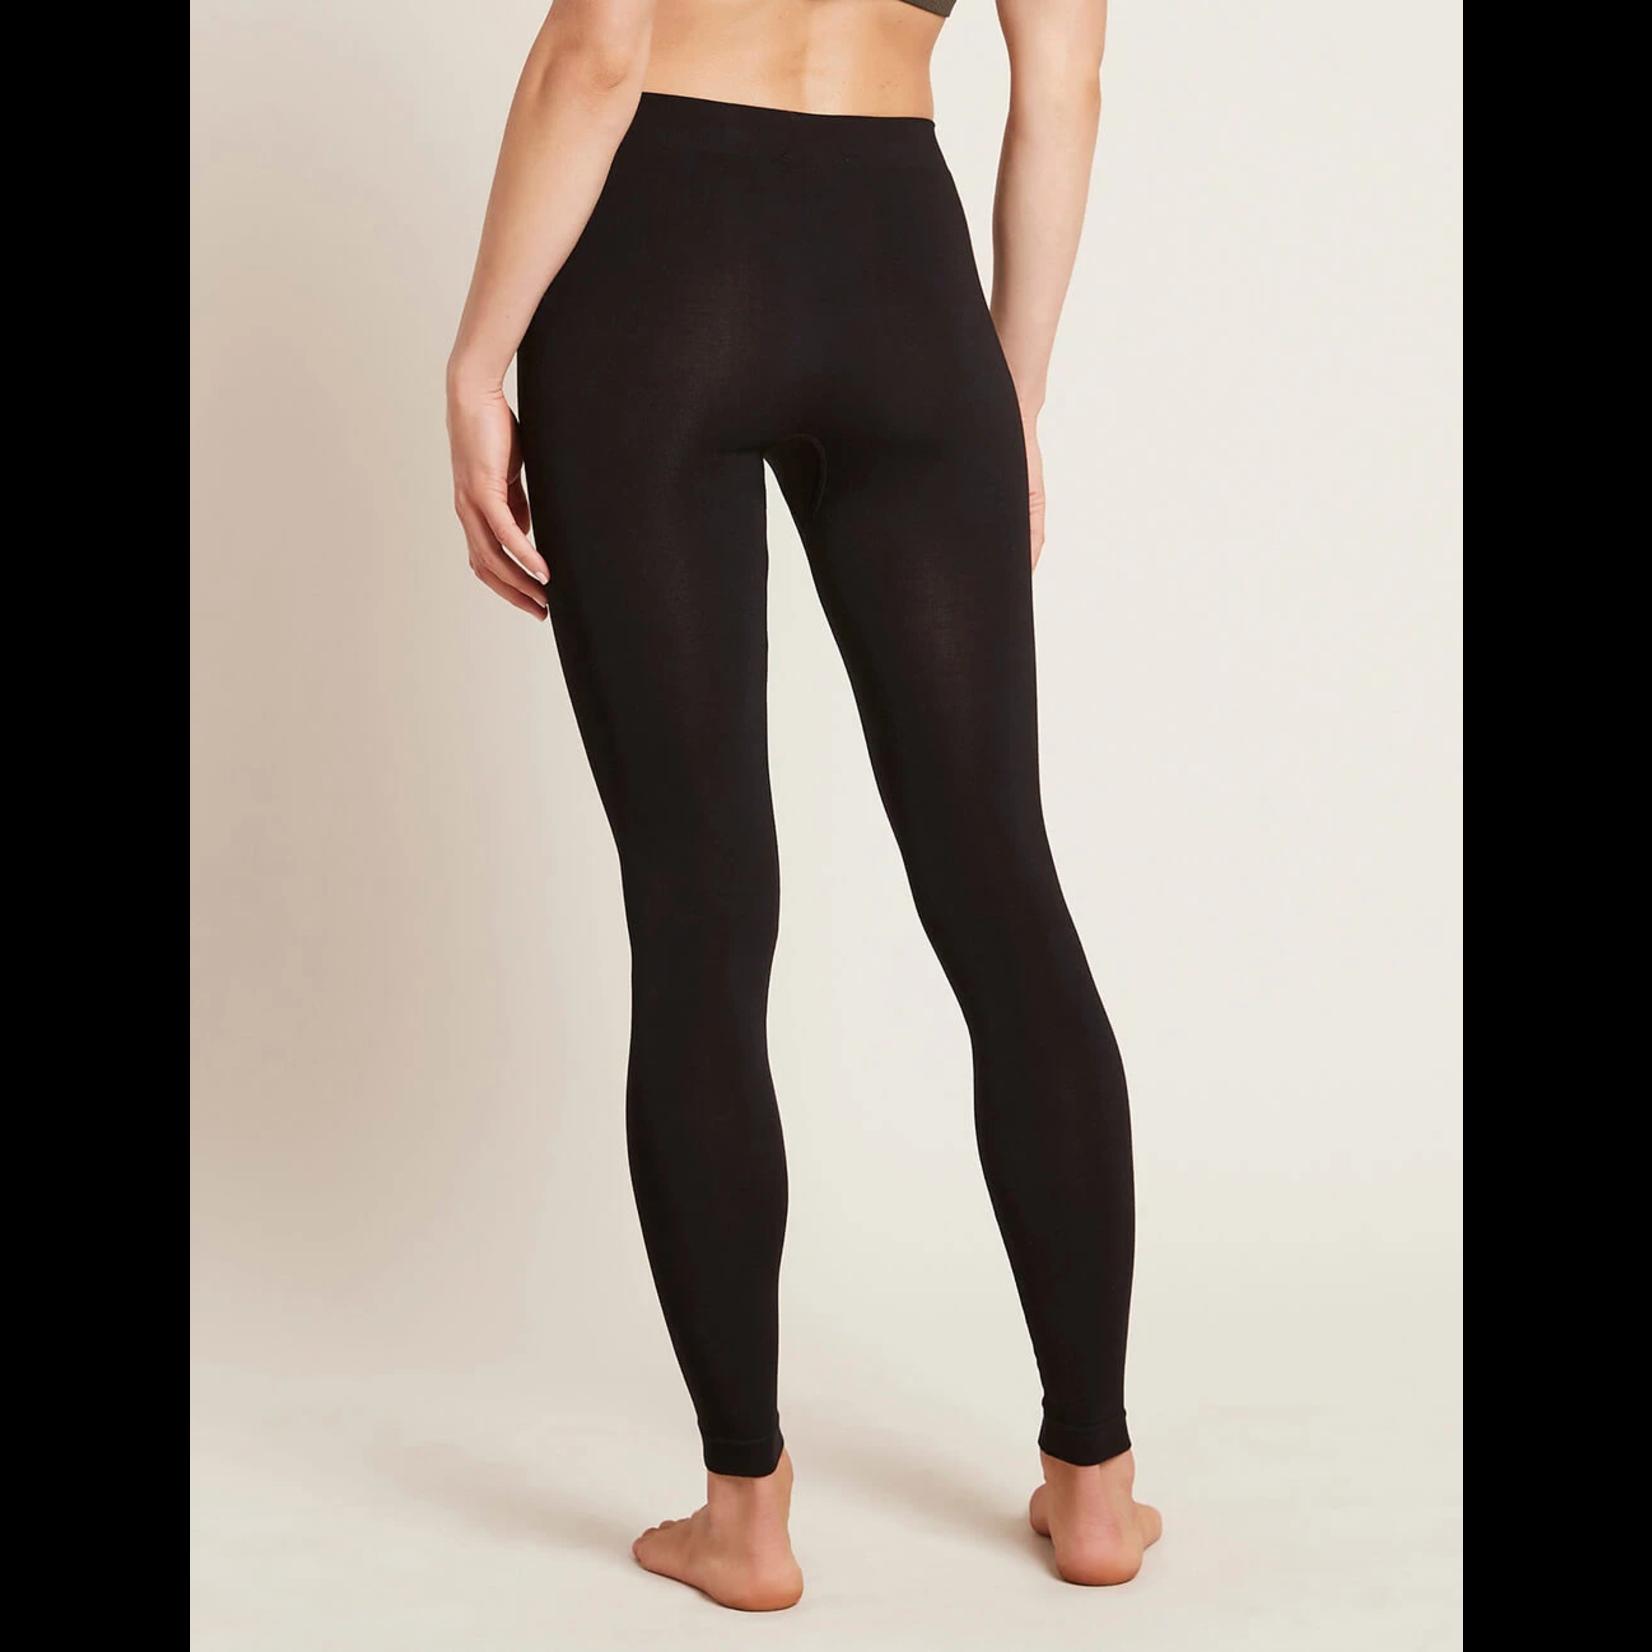 Boody Boody Women's Full Leggings Black